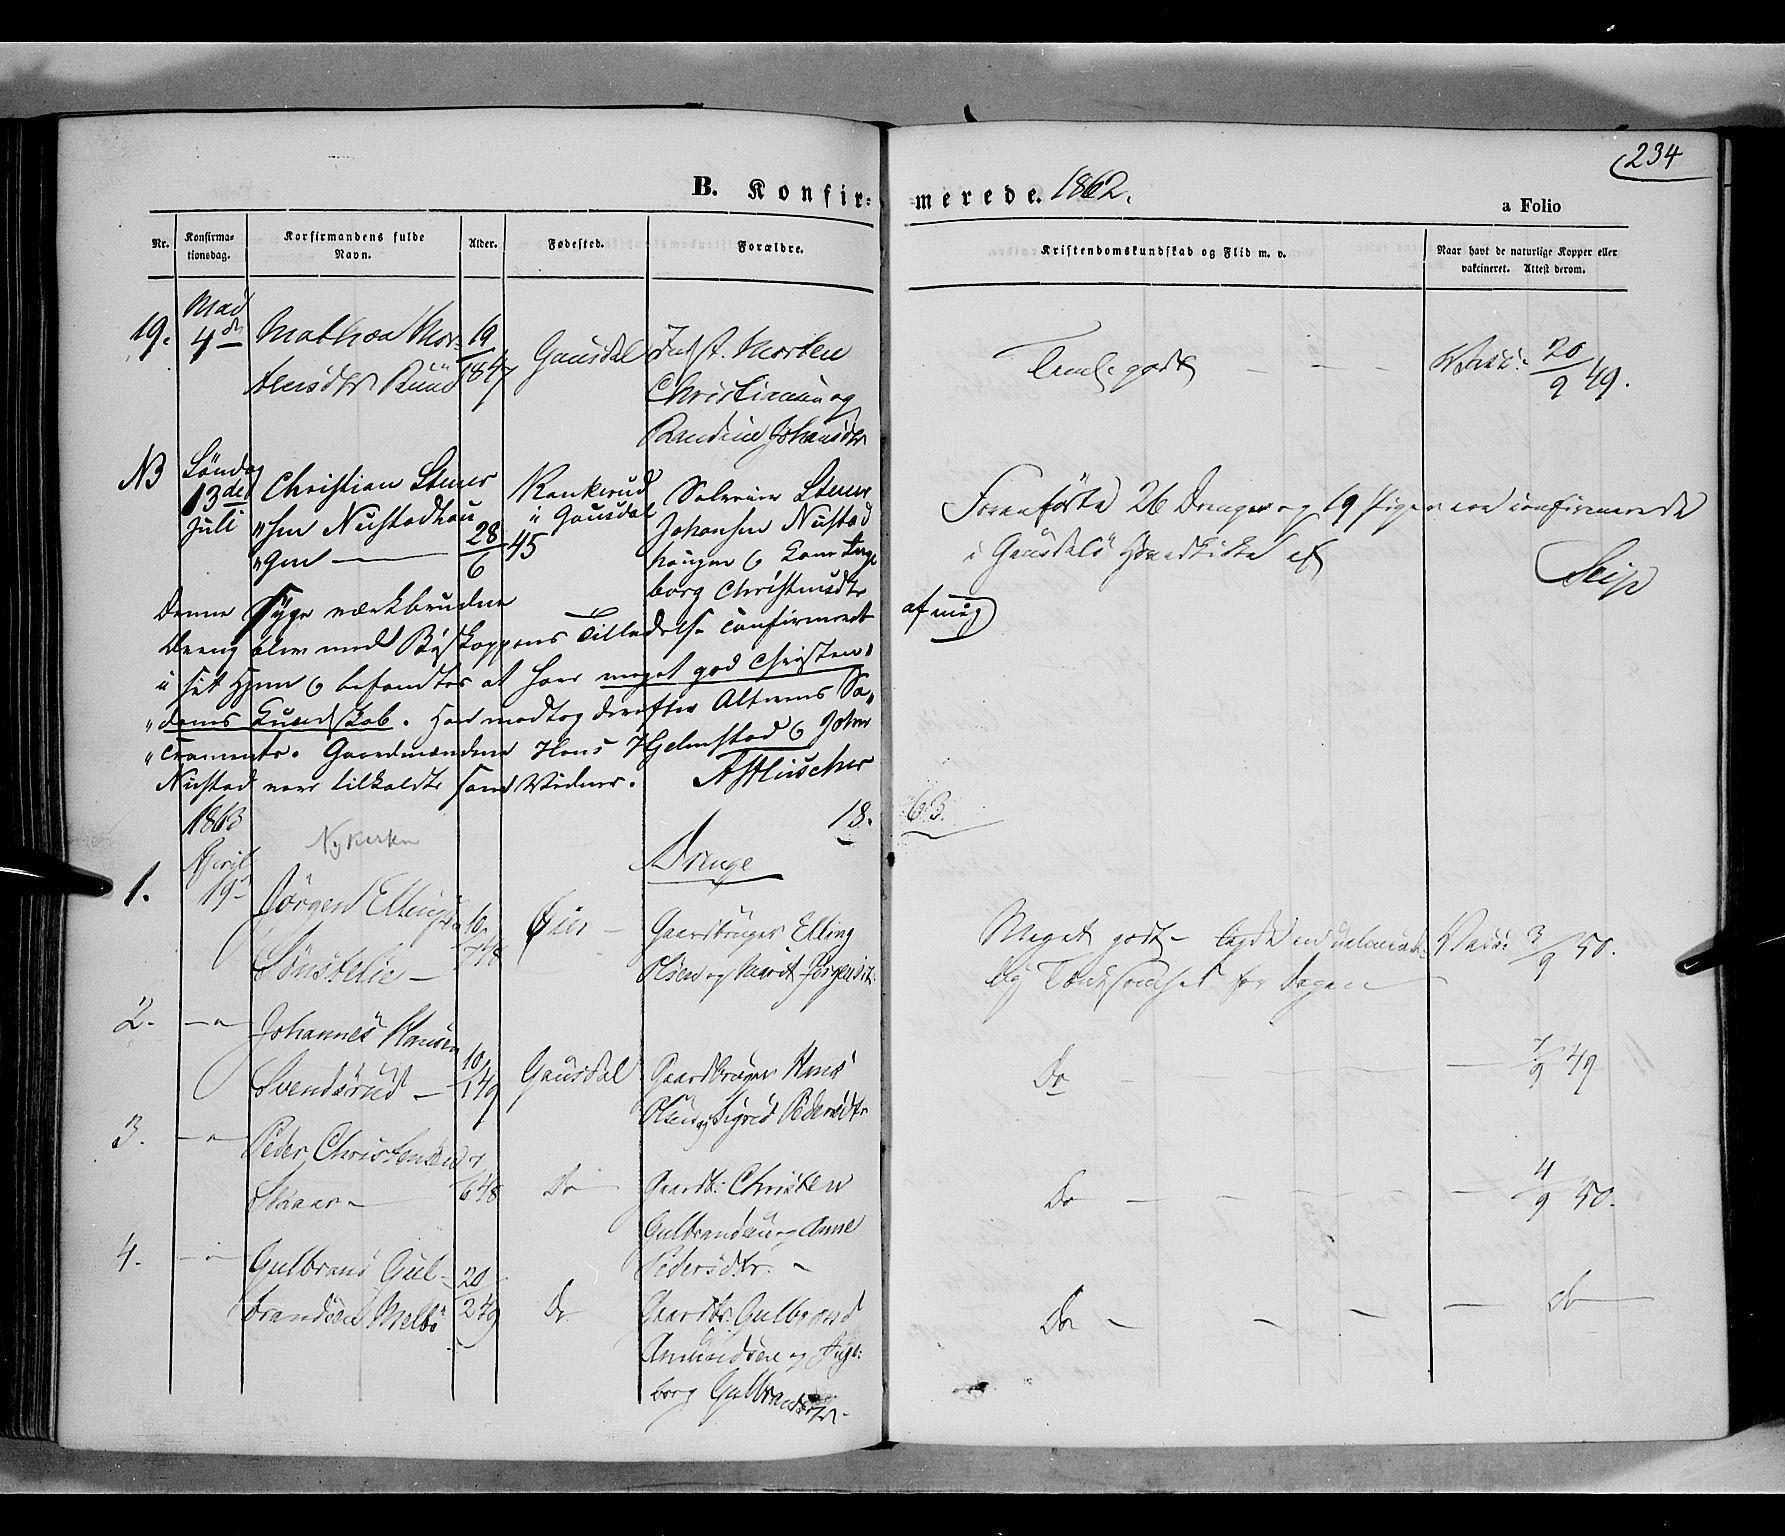 SAH, Gausdal prestekontor, Ministerialbok nr. 9, 1862-1873, s. 234